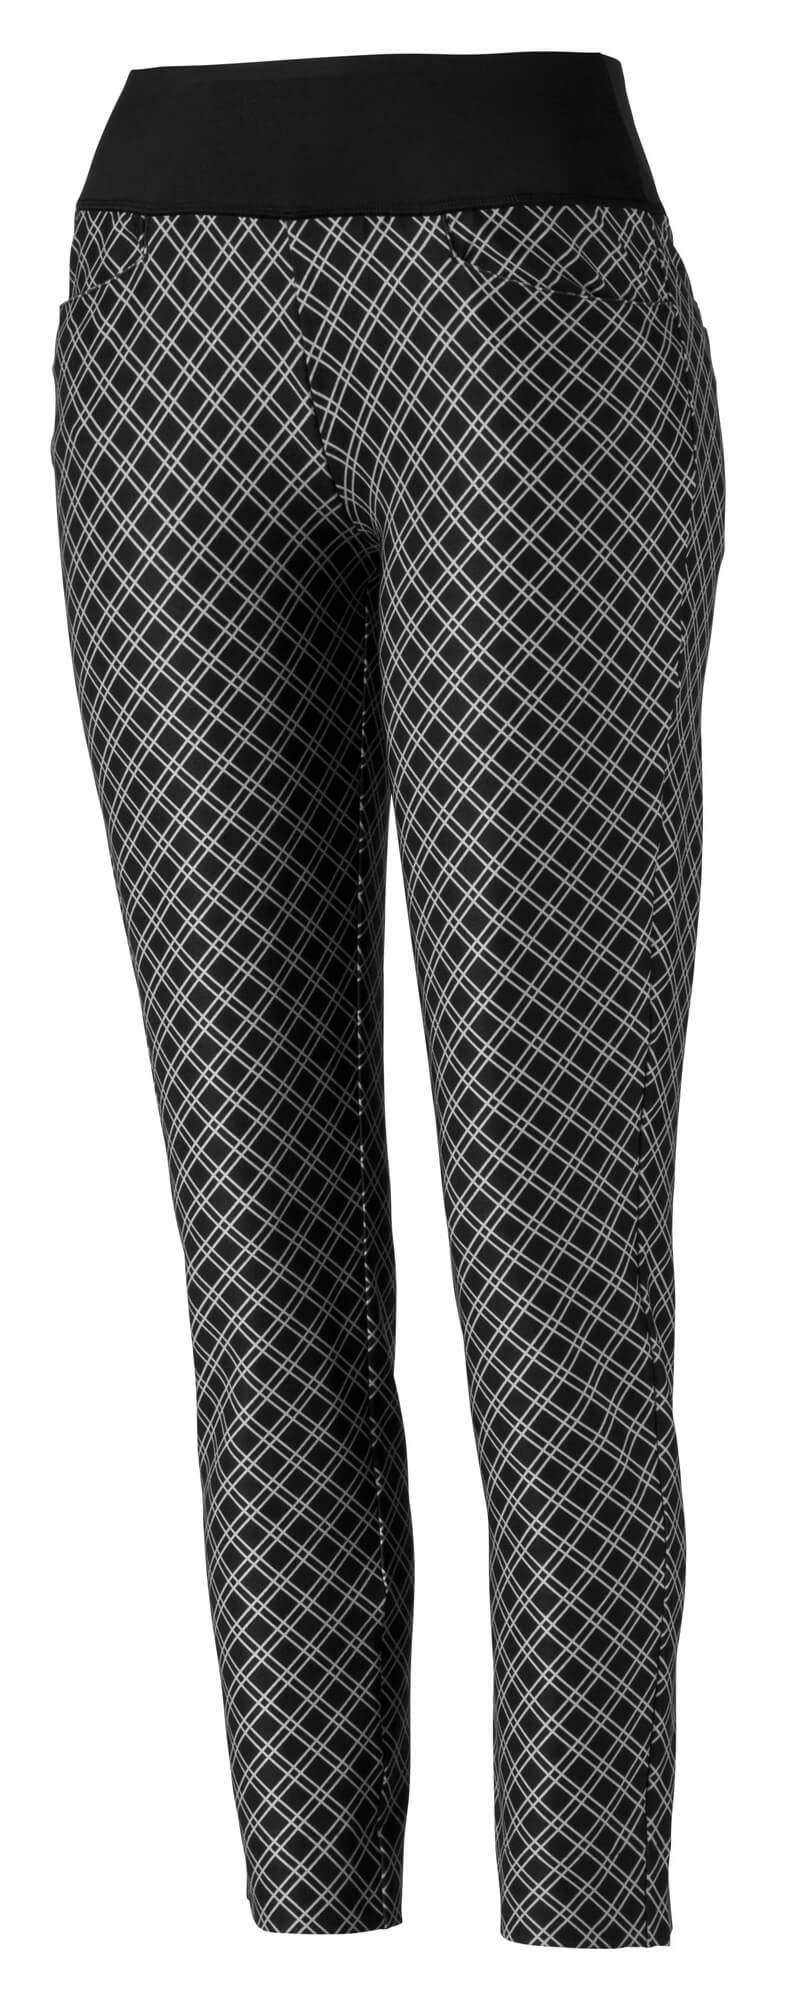 Puma Golf Women's 2019 Pwrshape Checker Pant, Puma Black, x Large by PUMA